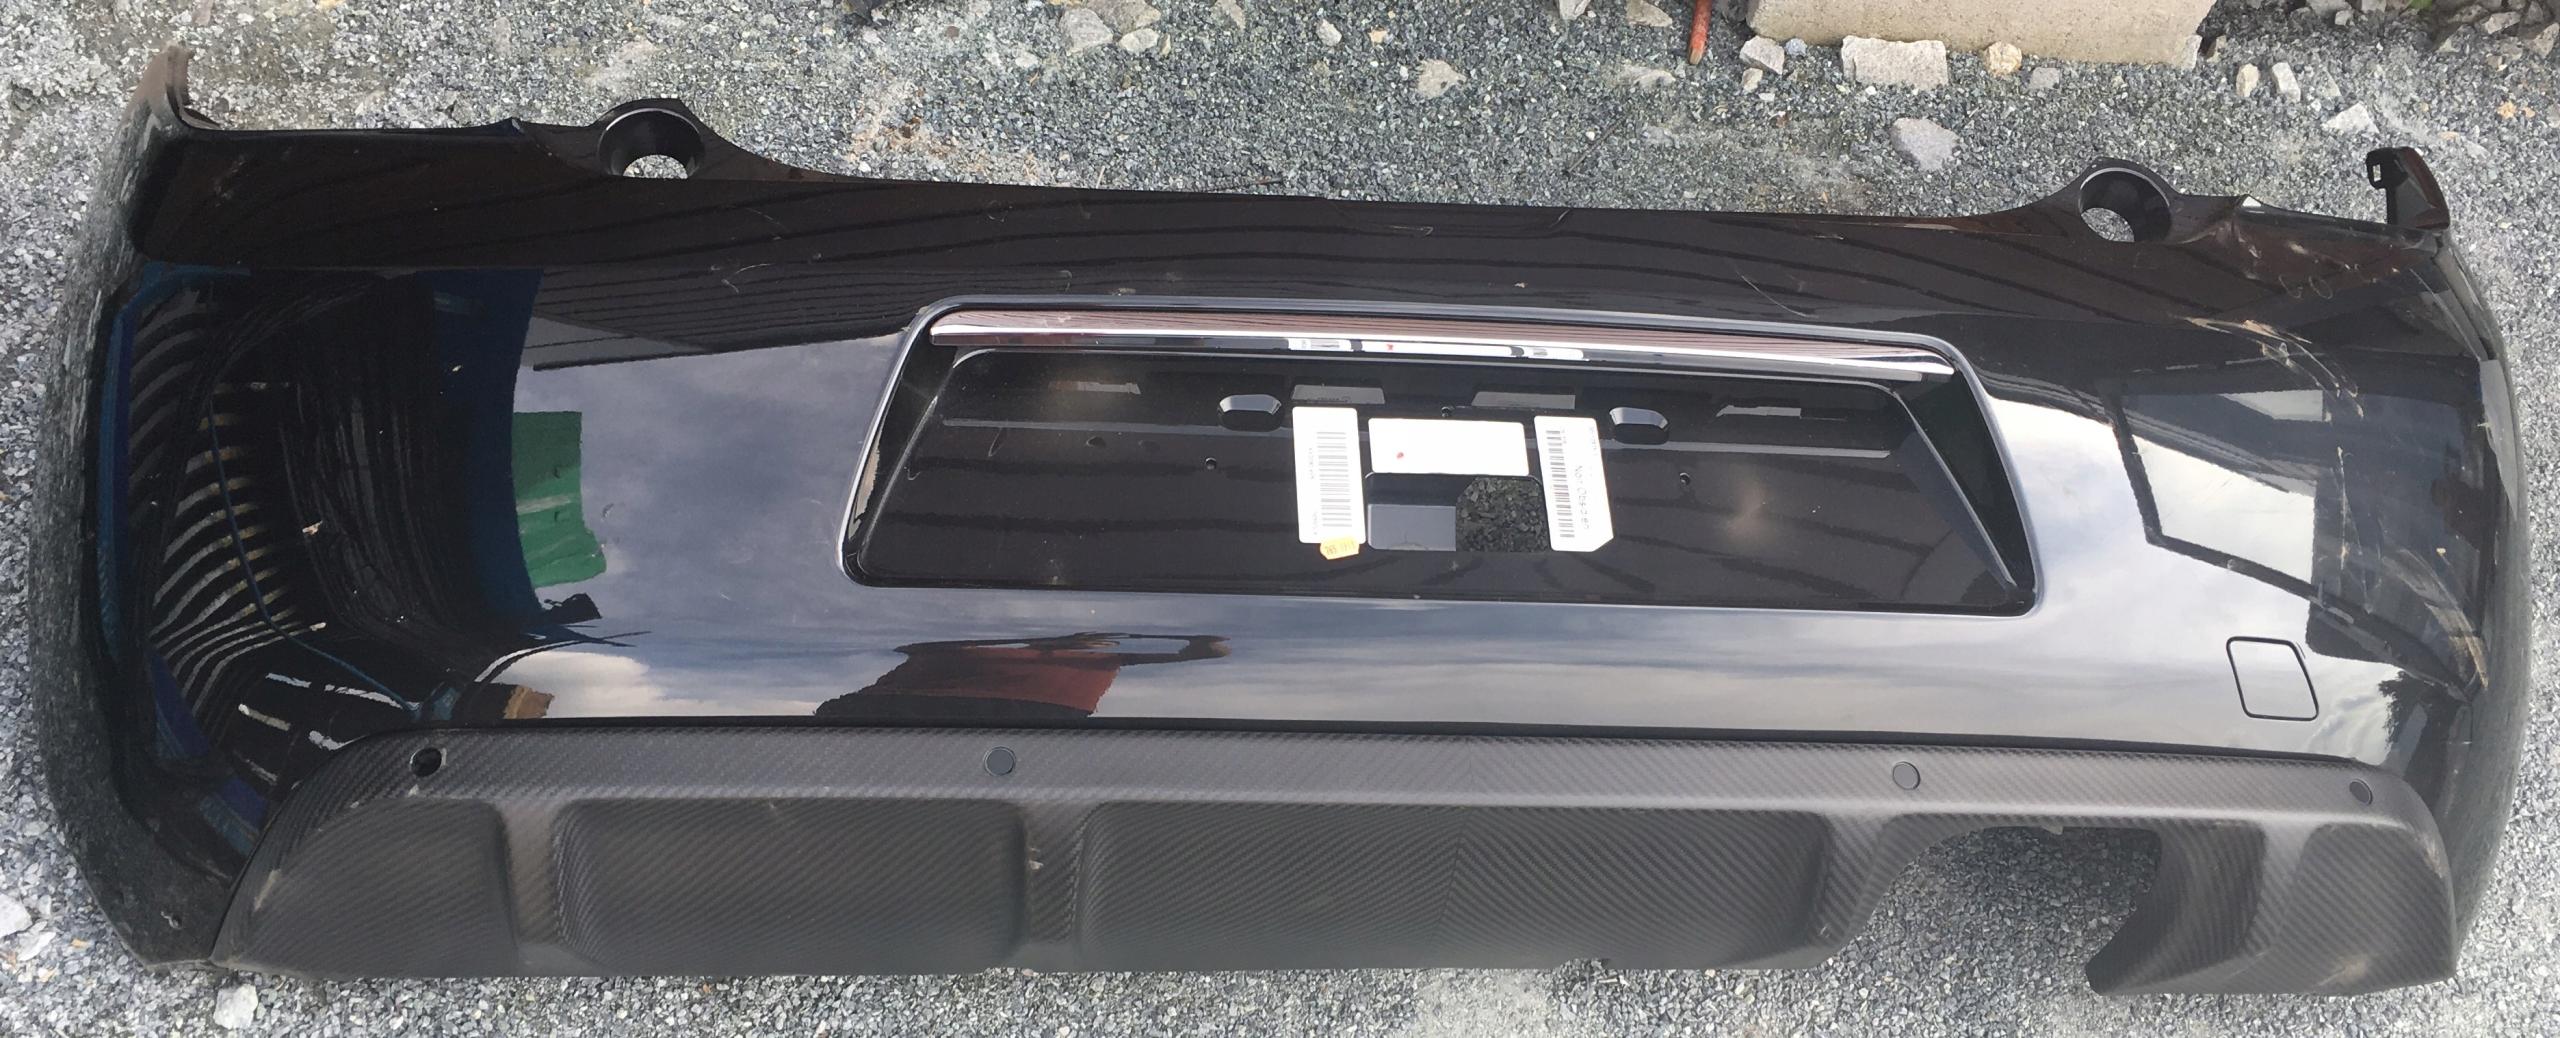 Citroen Ds3 Racing Lift Zderzak Tyl Kompletny Pdc Tarchaly Wielkie Allegro Pl